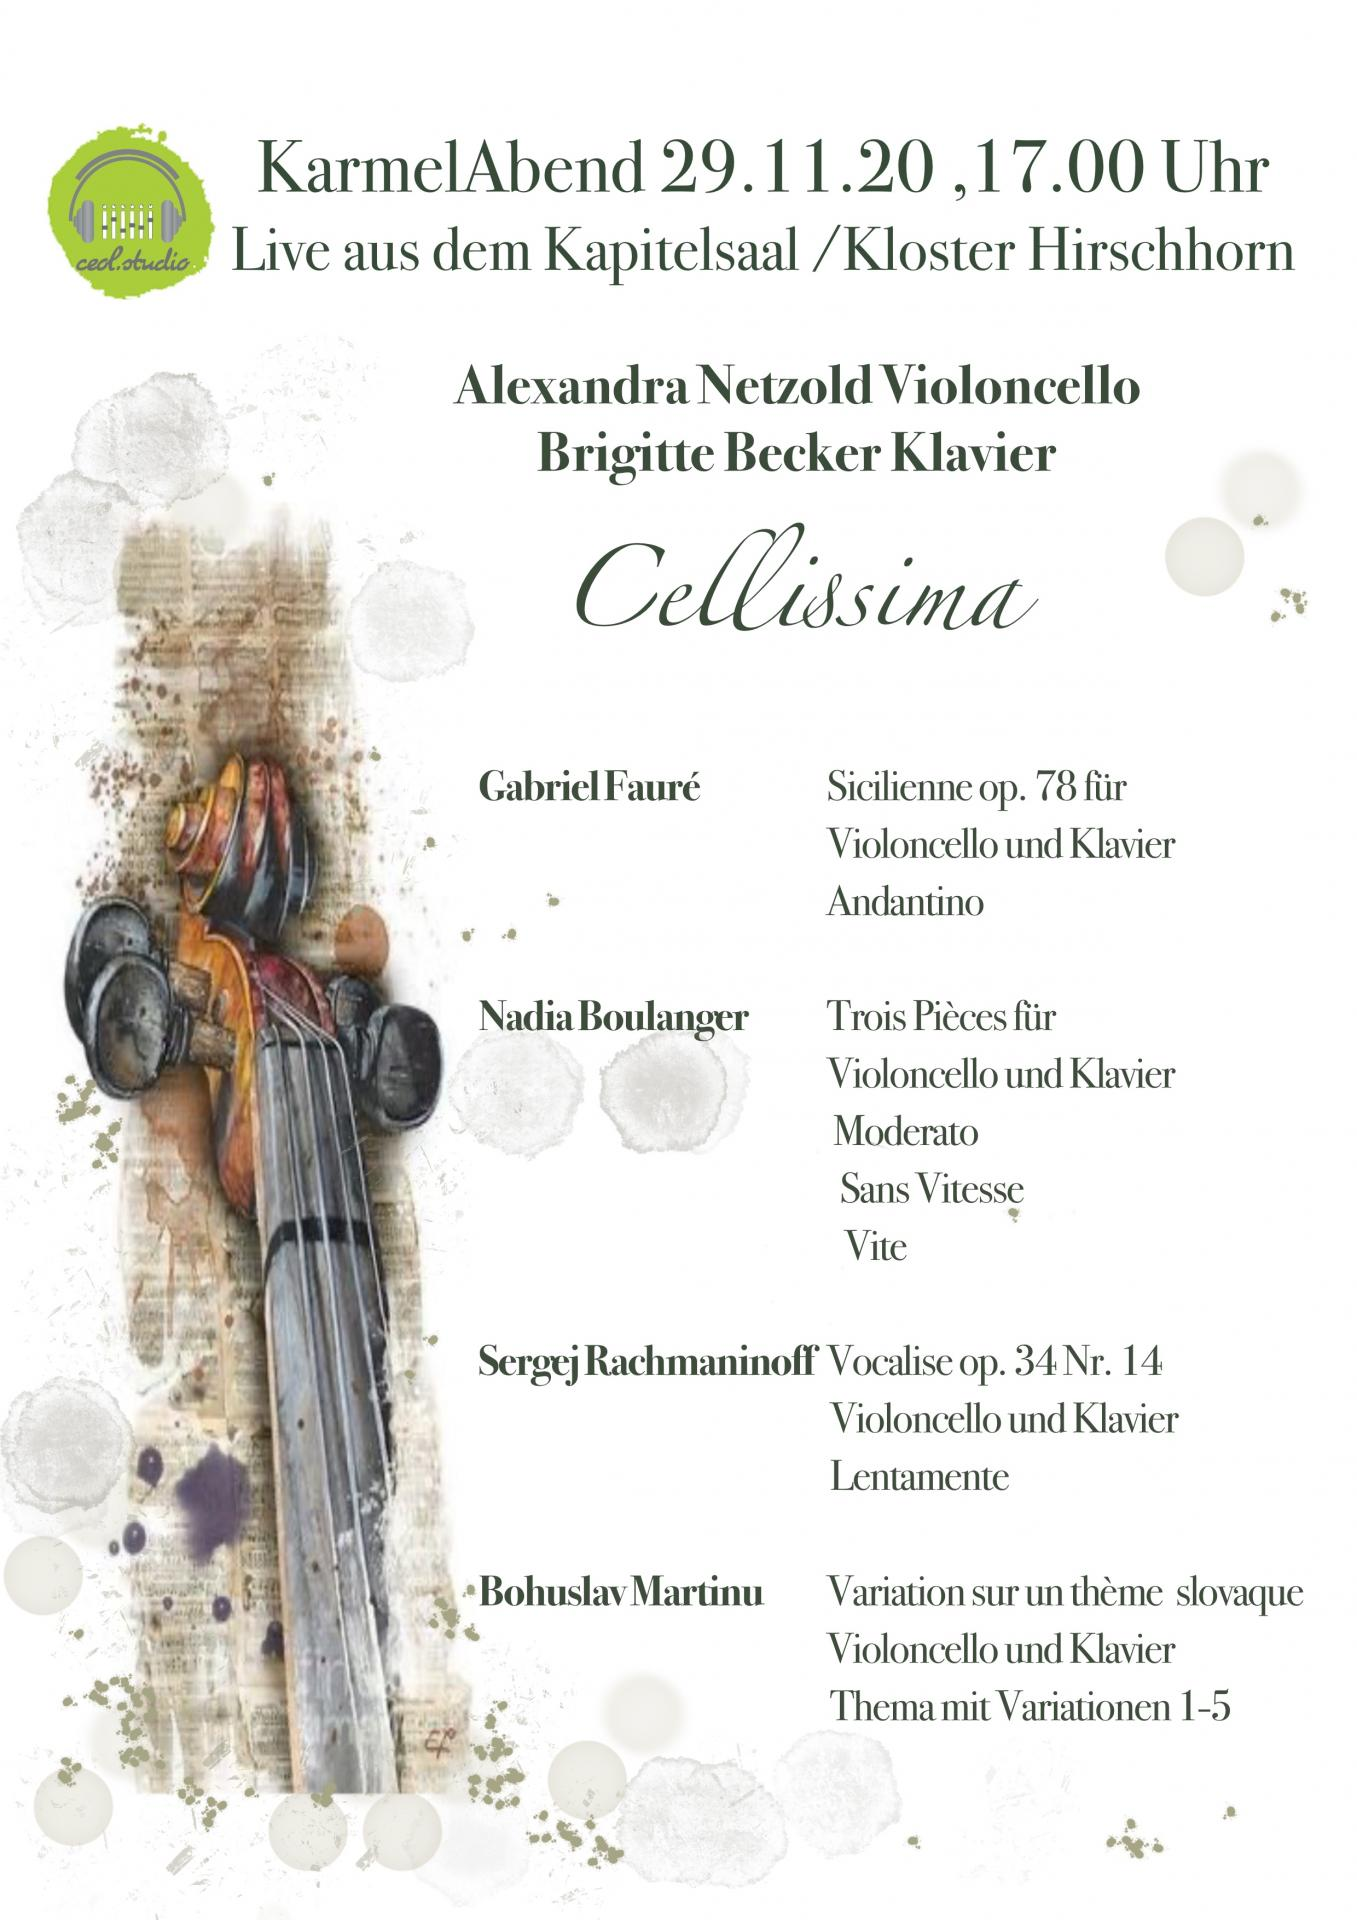 Programm Cellissima